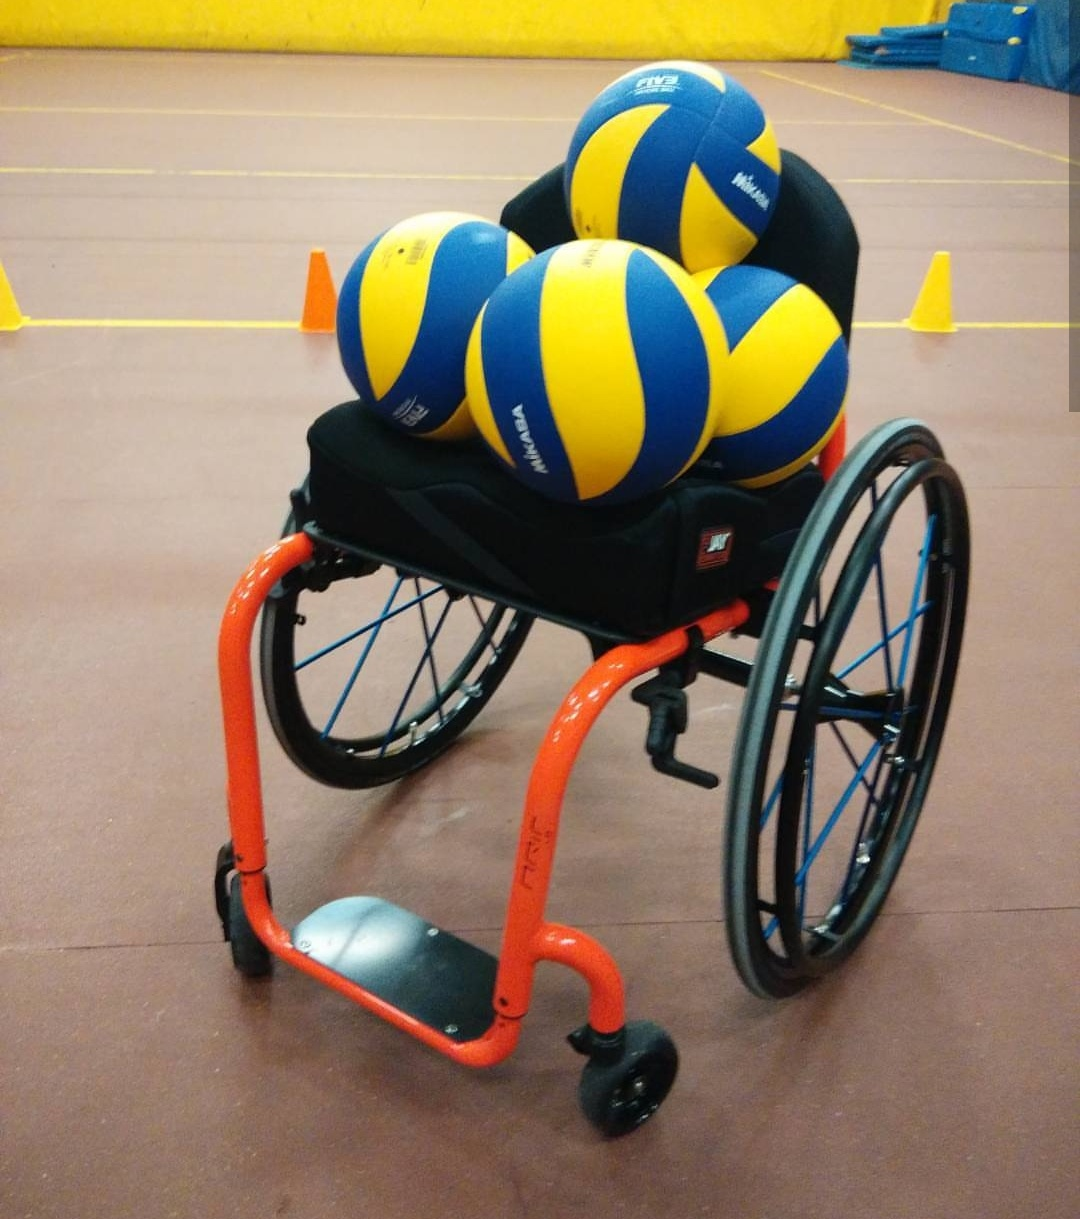 Carrozzina volley